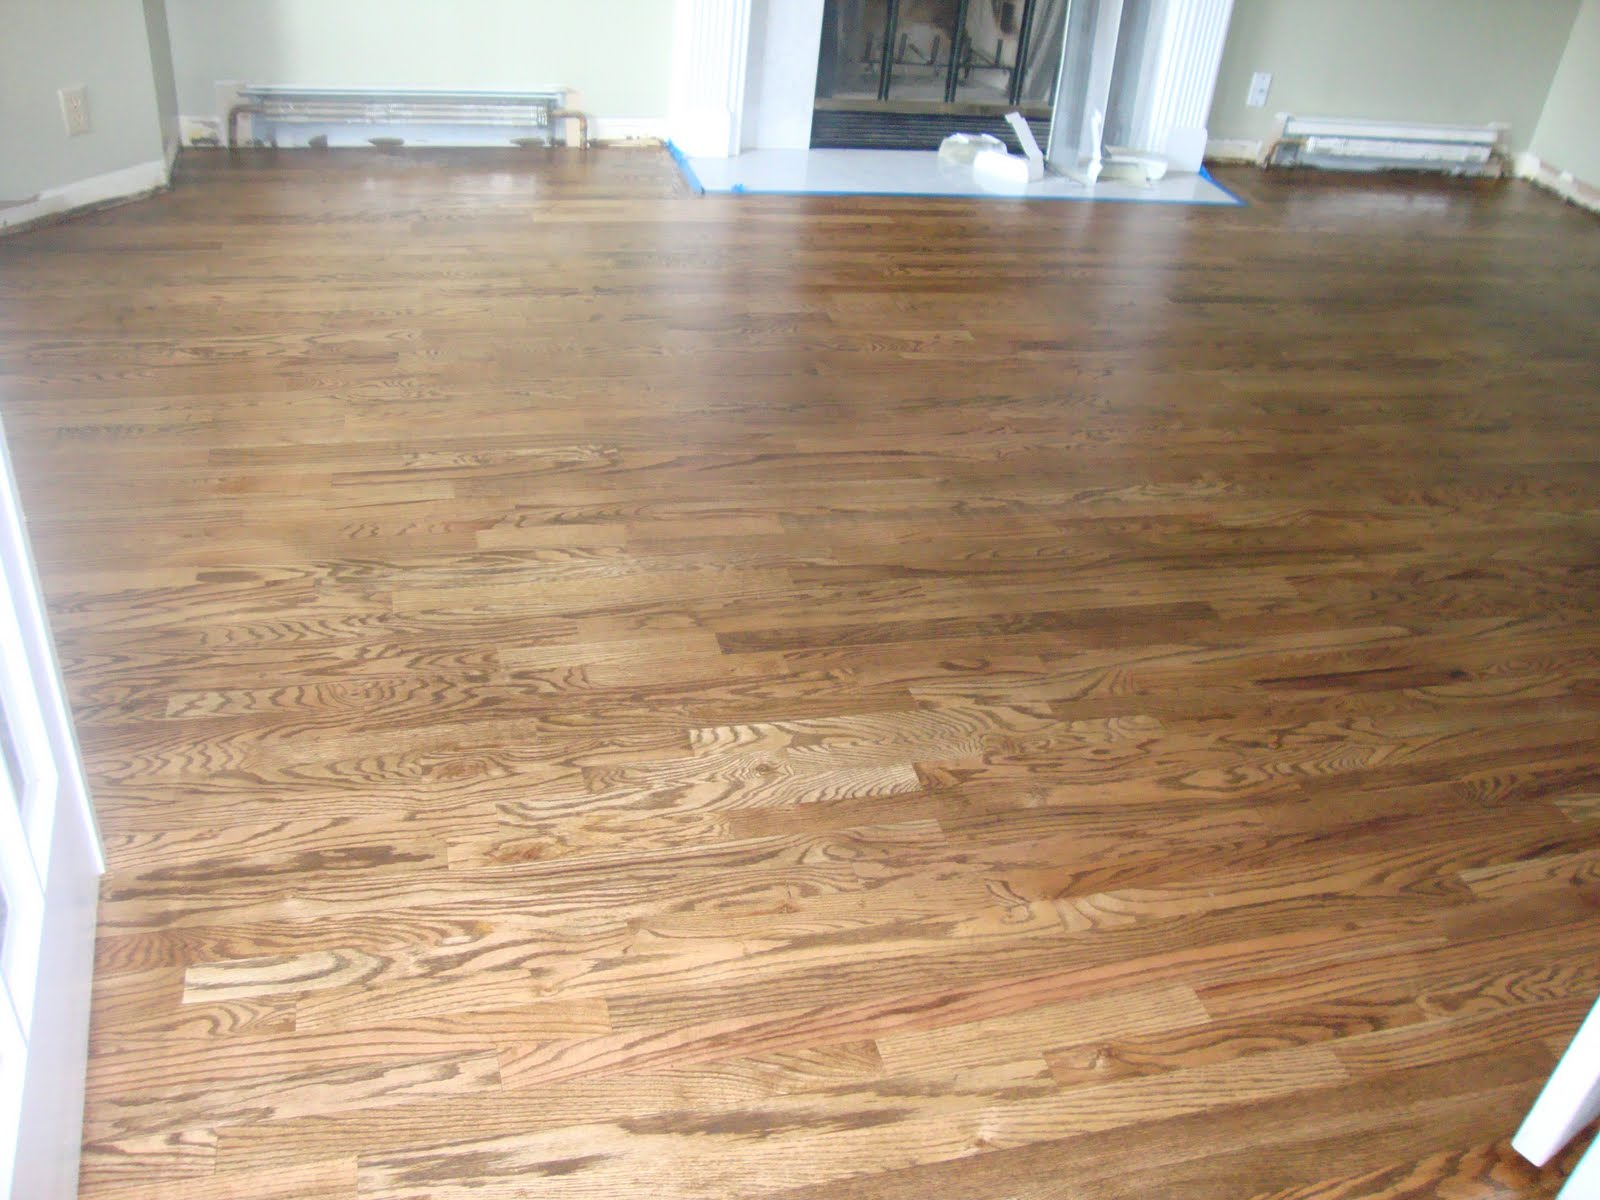 Refinish hardwood floors refinish hardwood floors utah for Refinishing painted hardwood floors